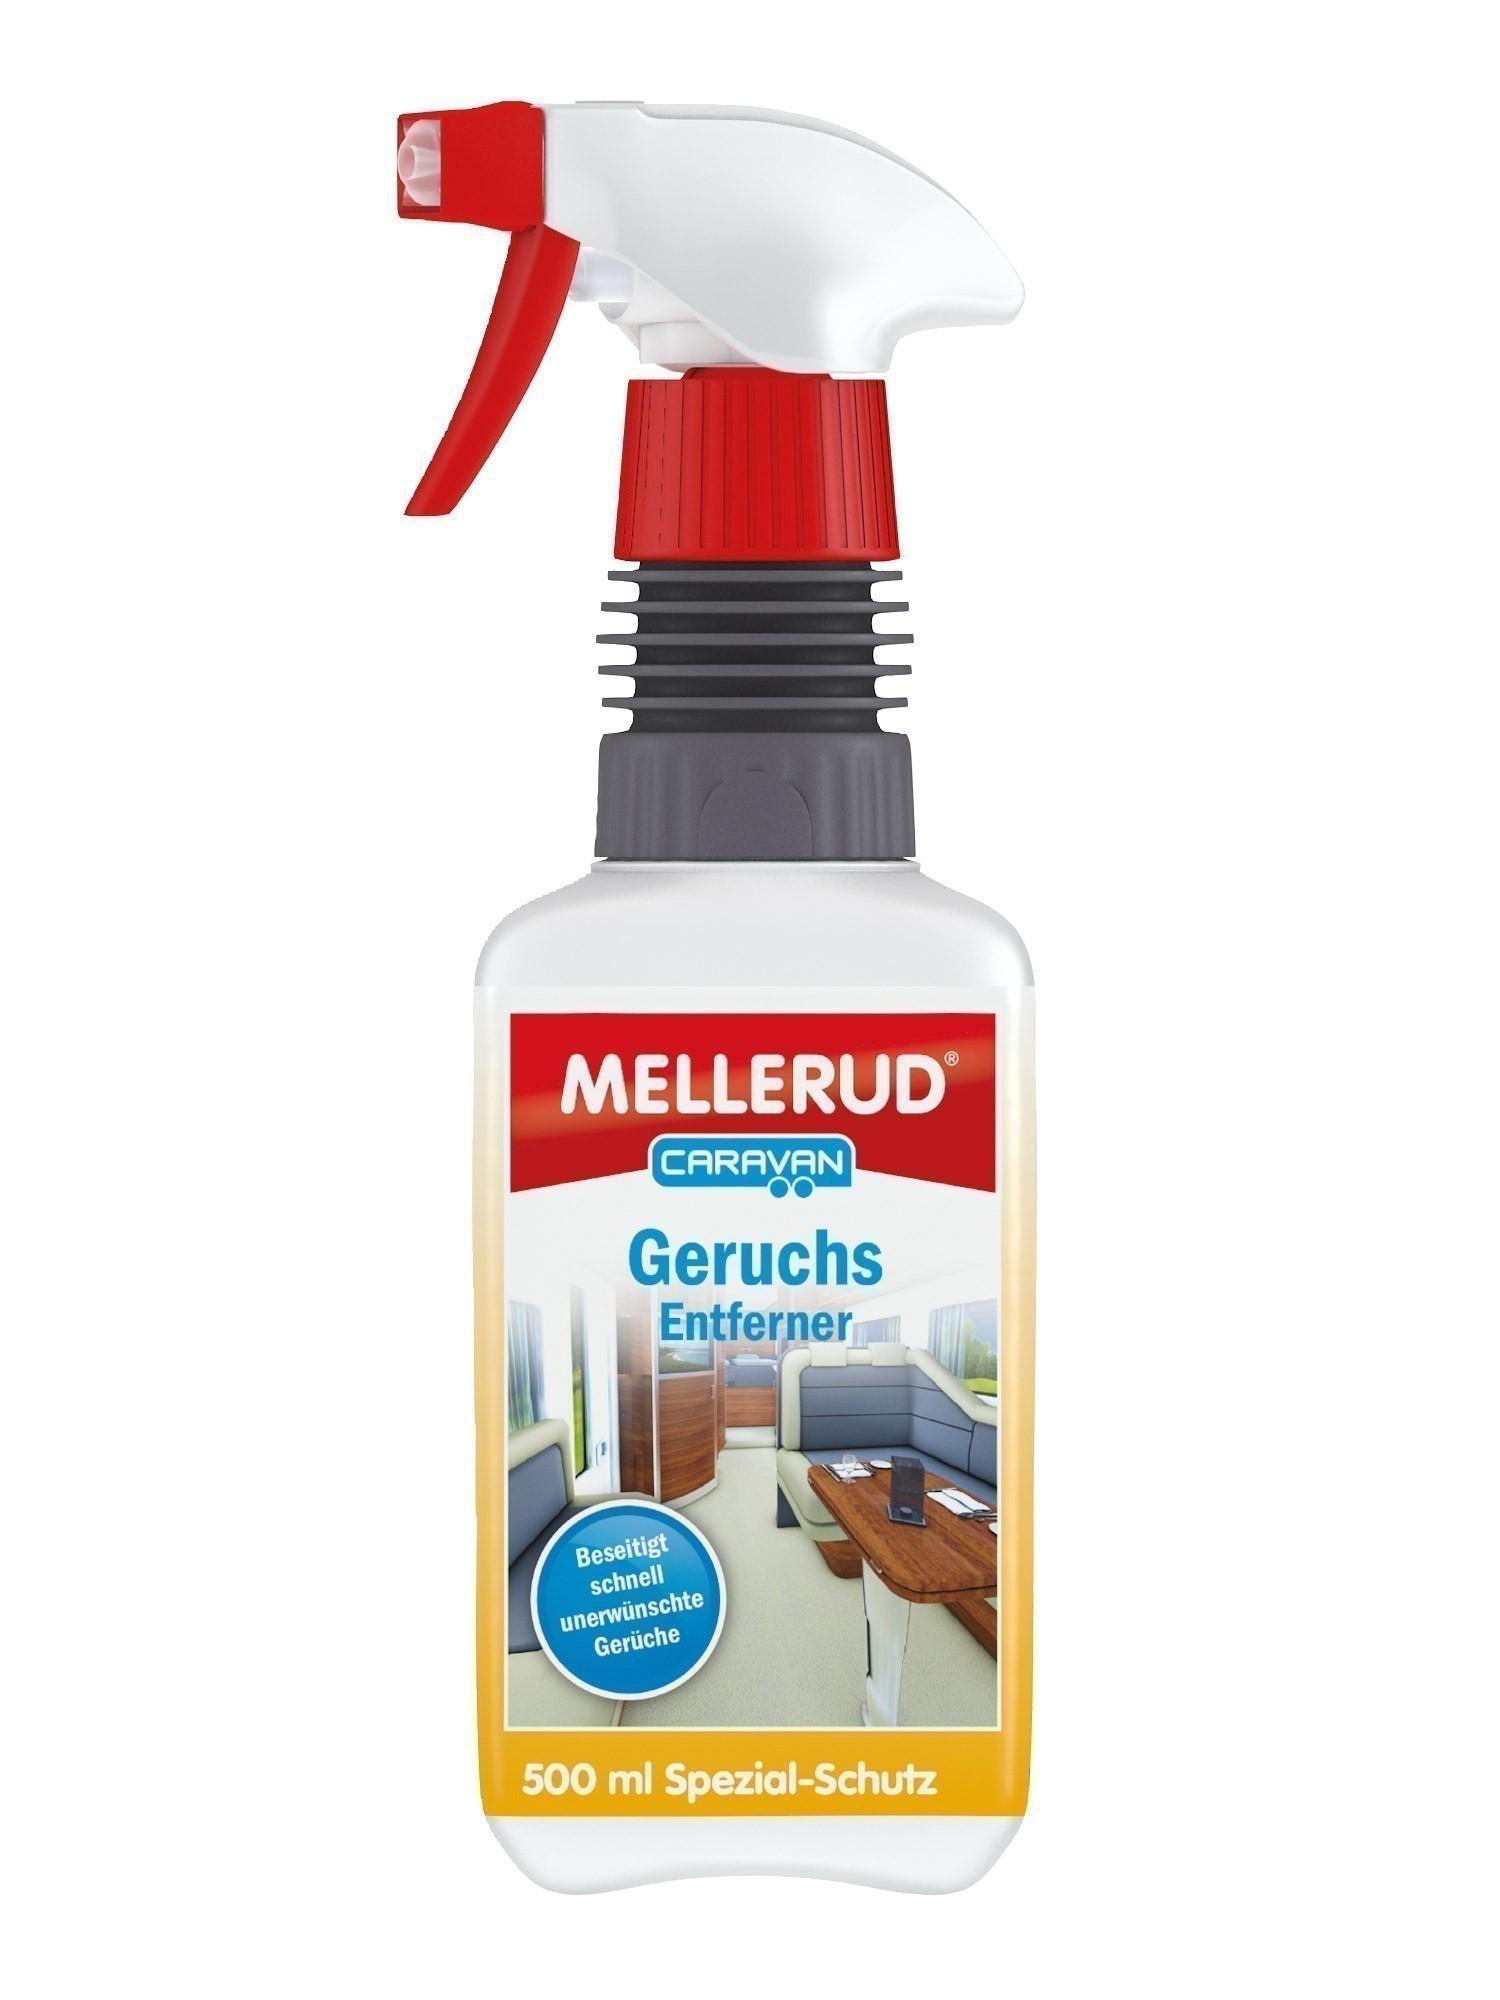 MELLERUD Caravan Geruchsentferner 0,5 Liter Bild 1